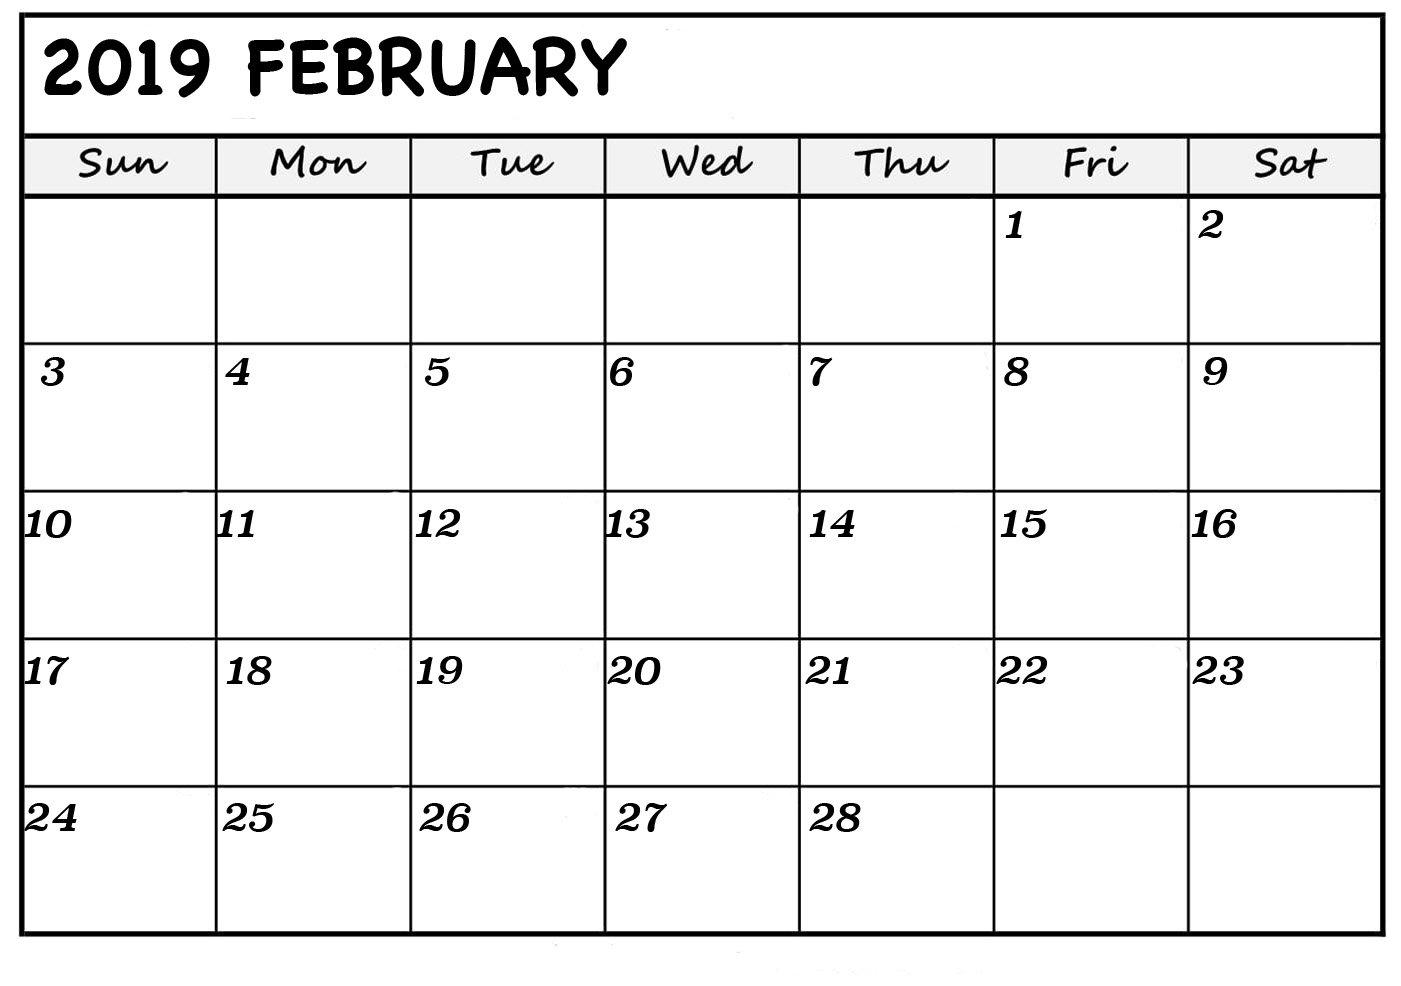 Free February 2019 Printable Calendar Templates – Calendar Calender You Can Edit